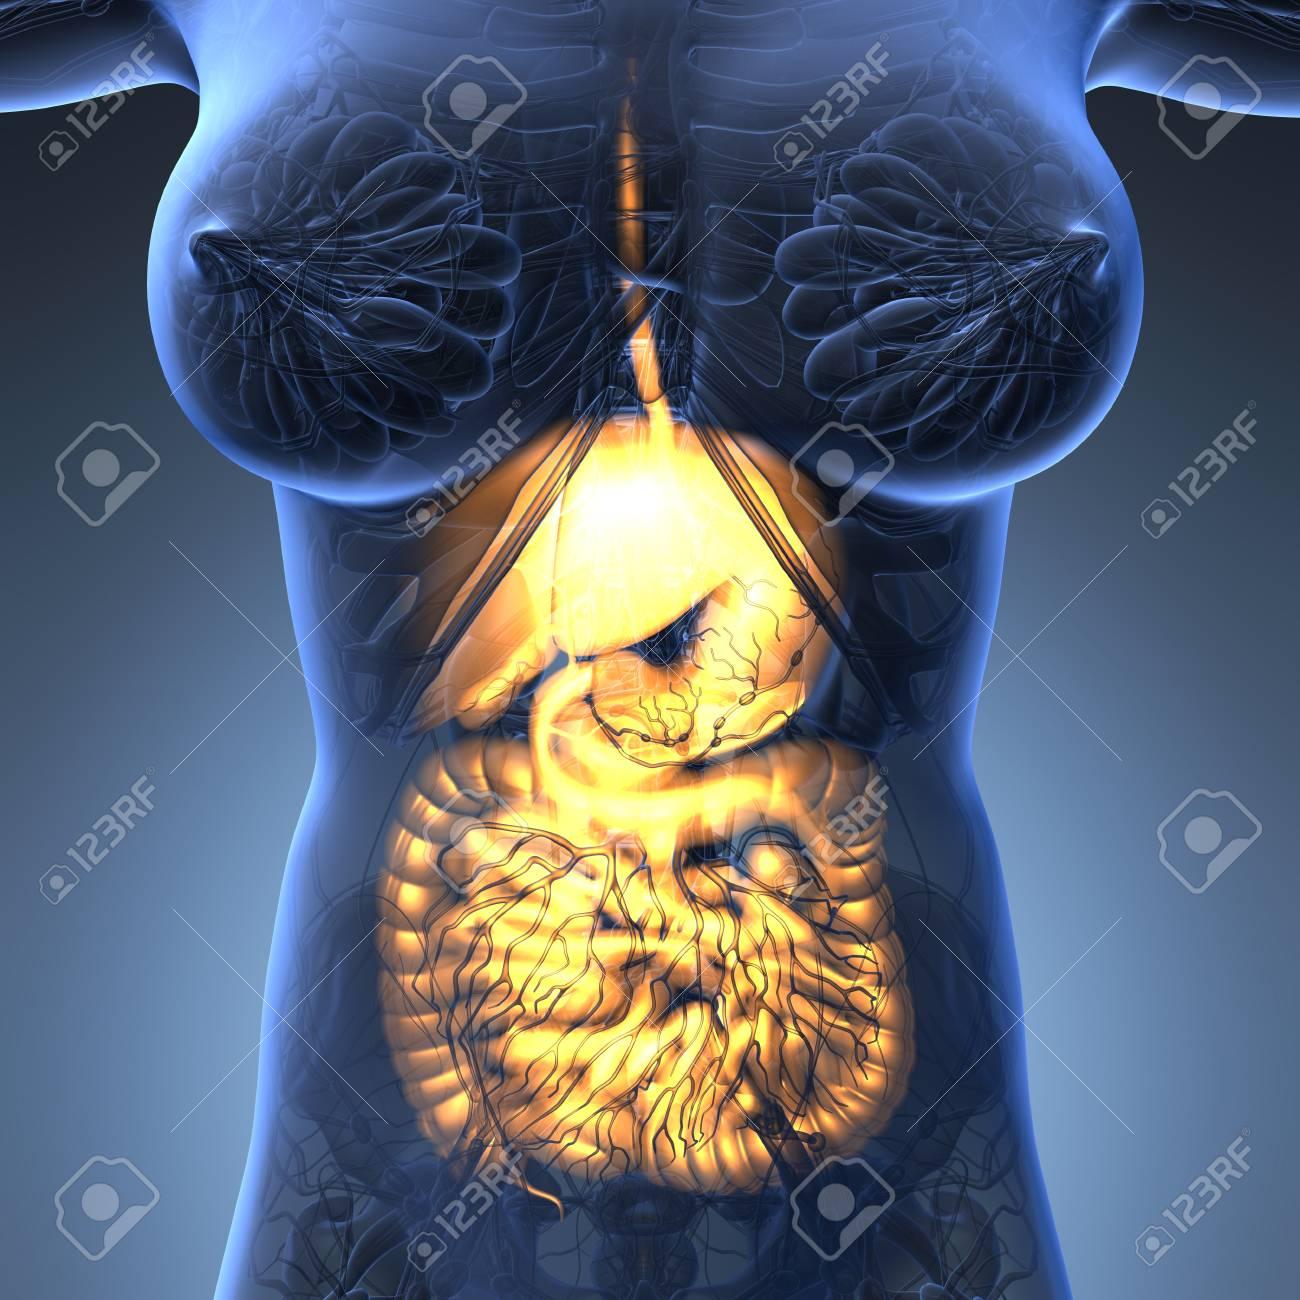 Science Anatomy Of Woman Body With Glow Digestive System Stock Photo